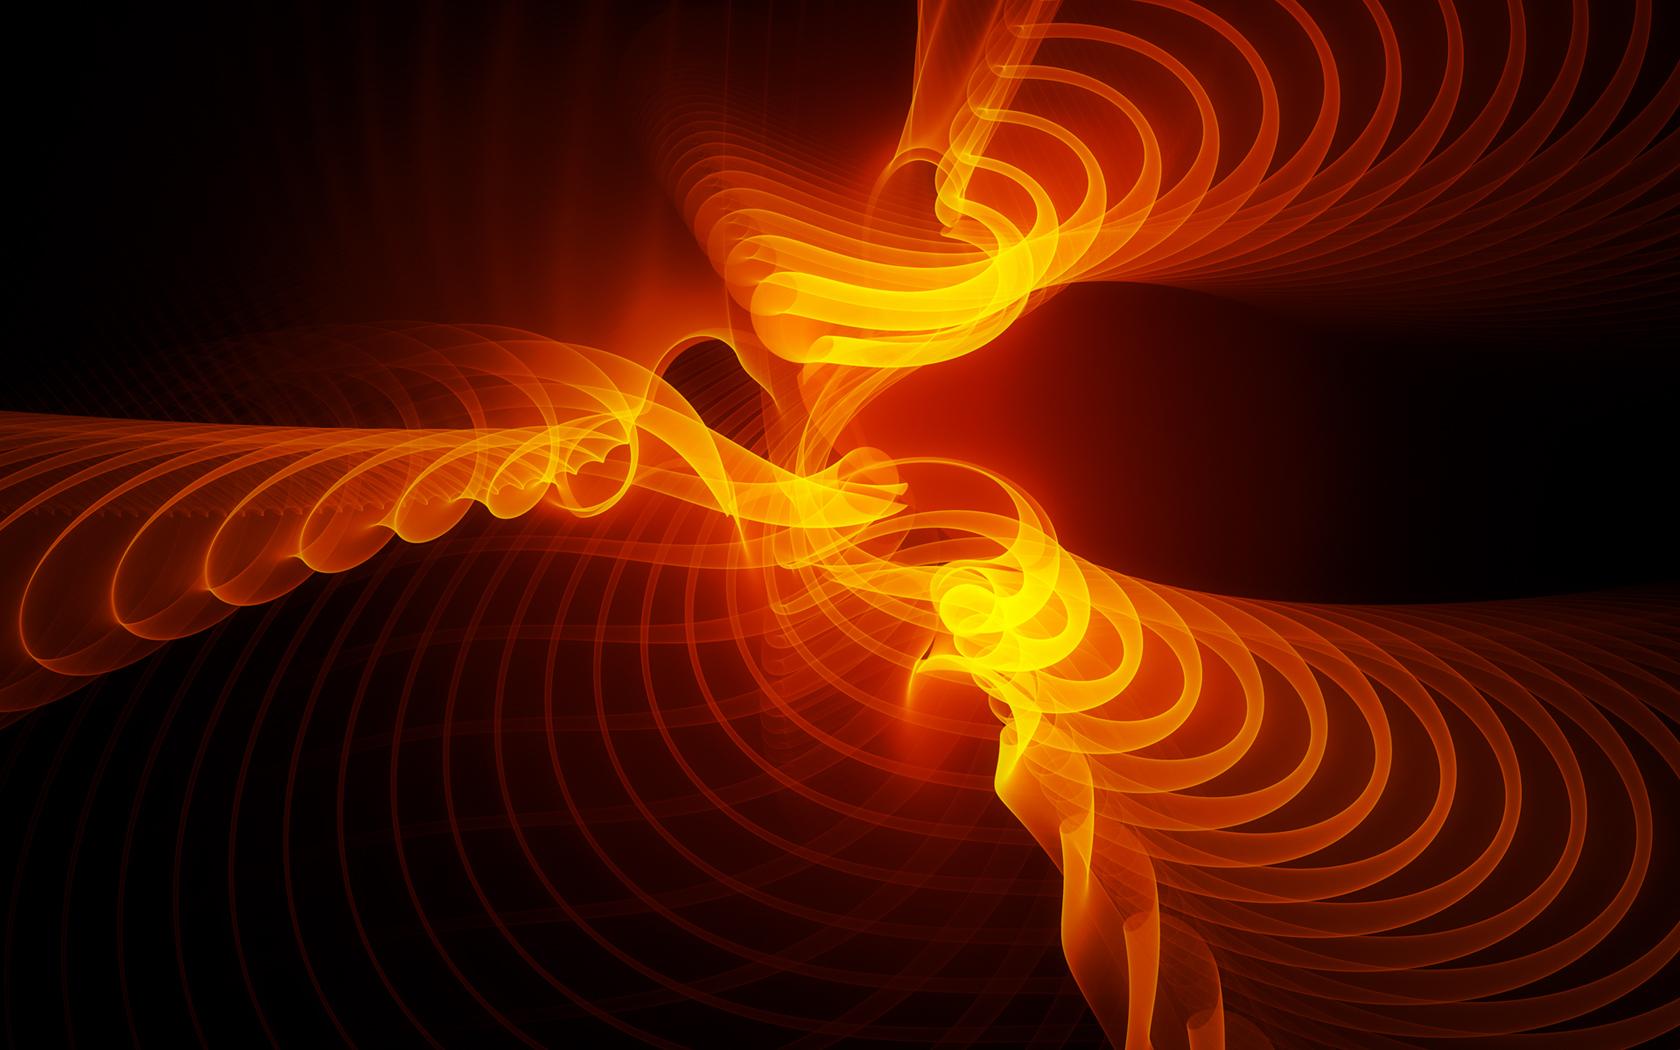 orange wave wallpaper - photo #16